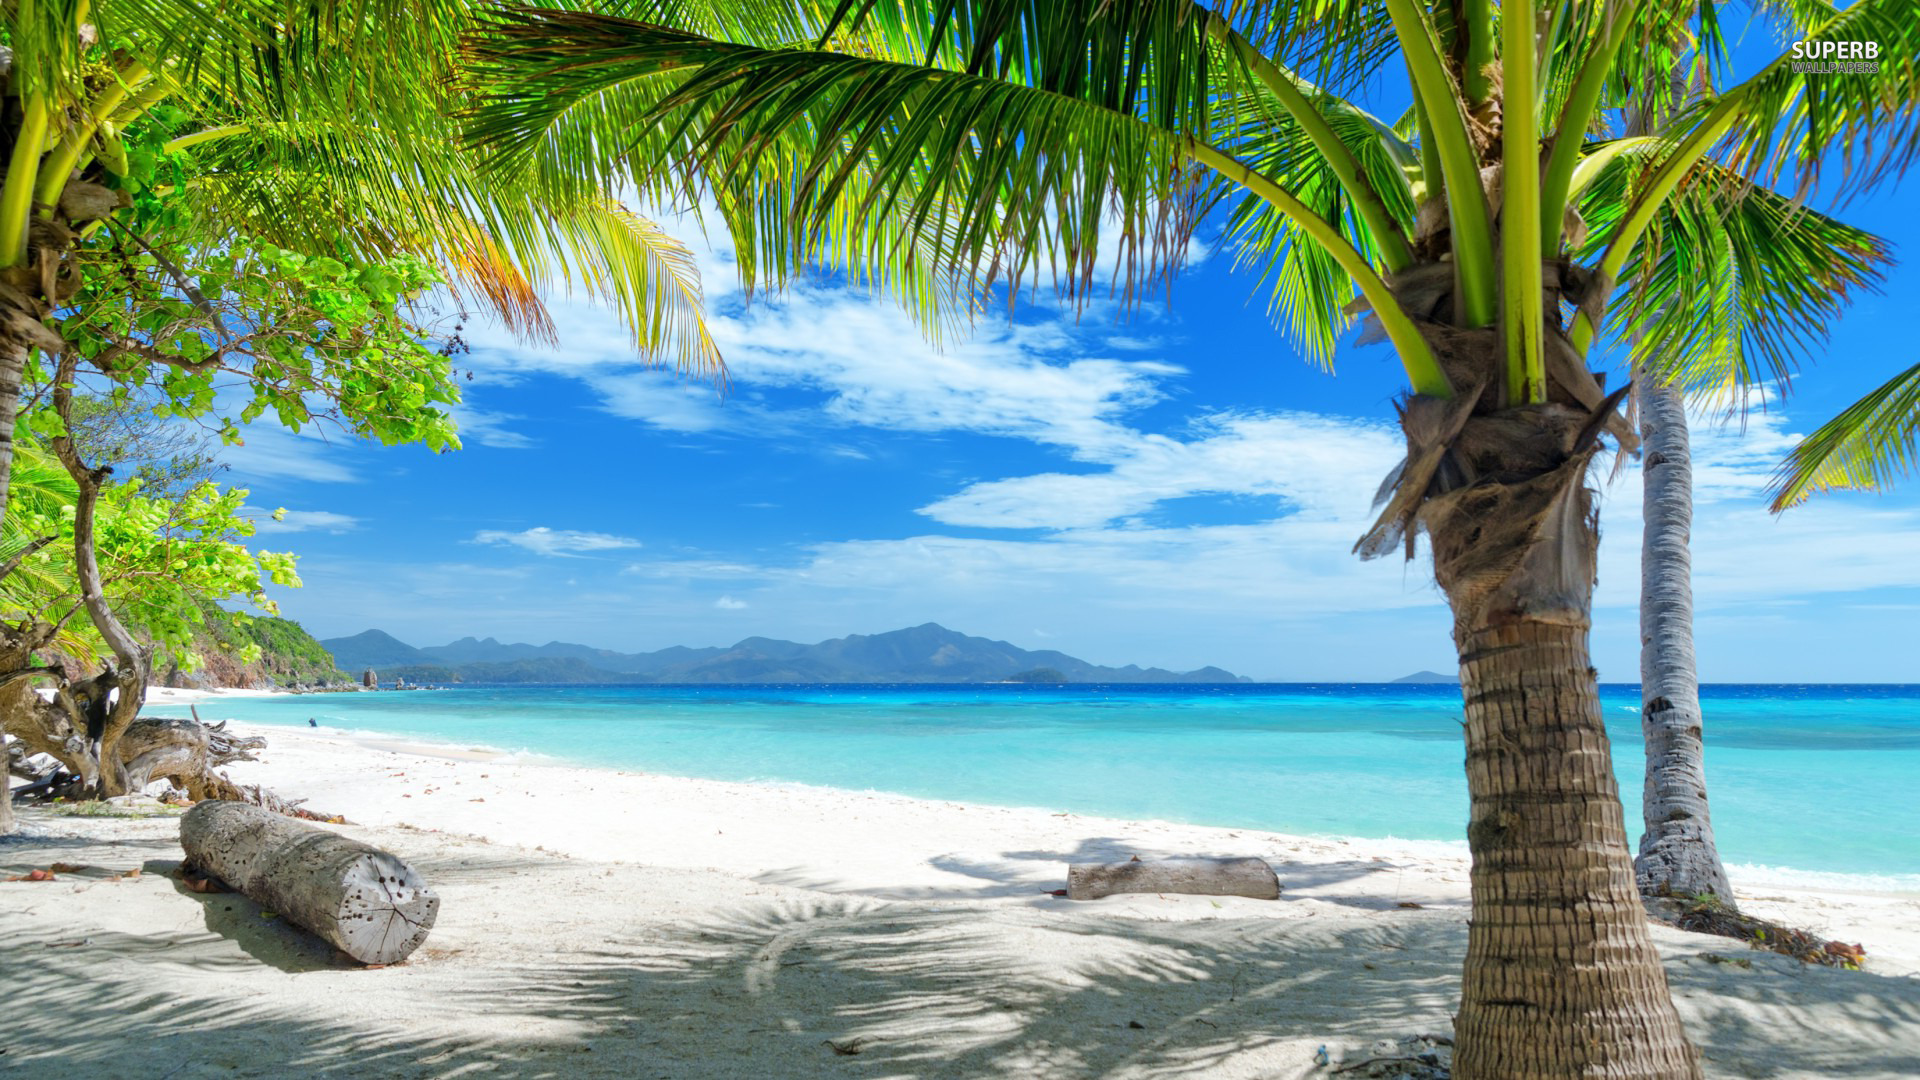 Screensaver Desert Island Android